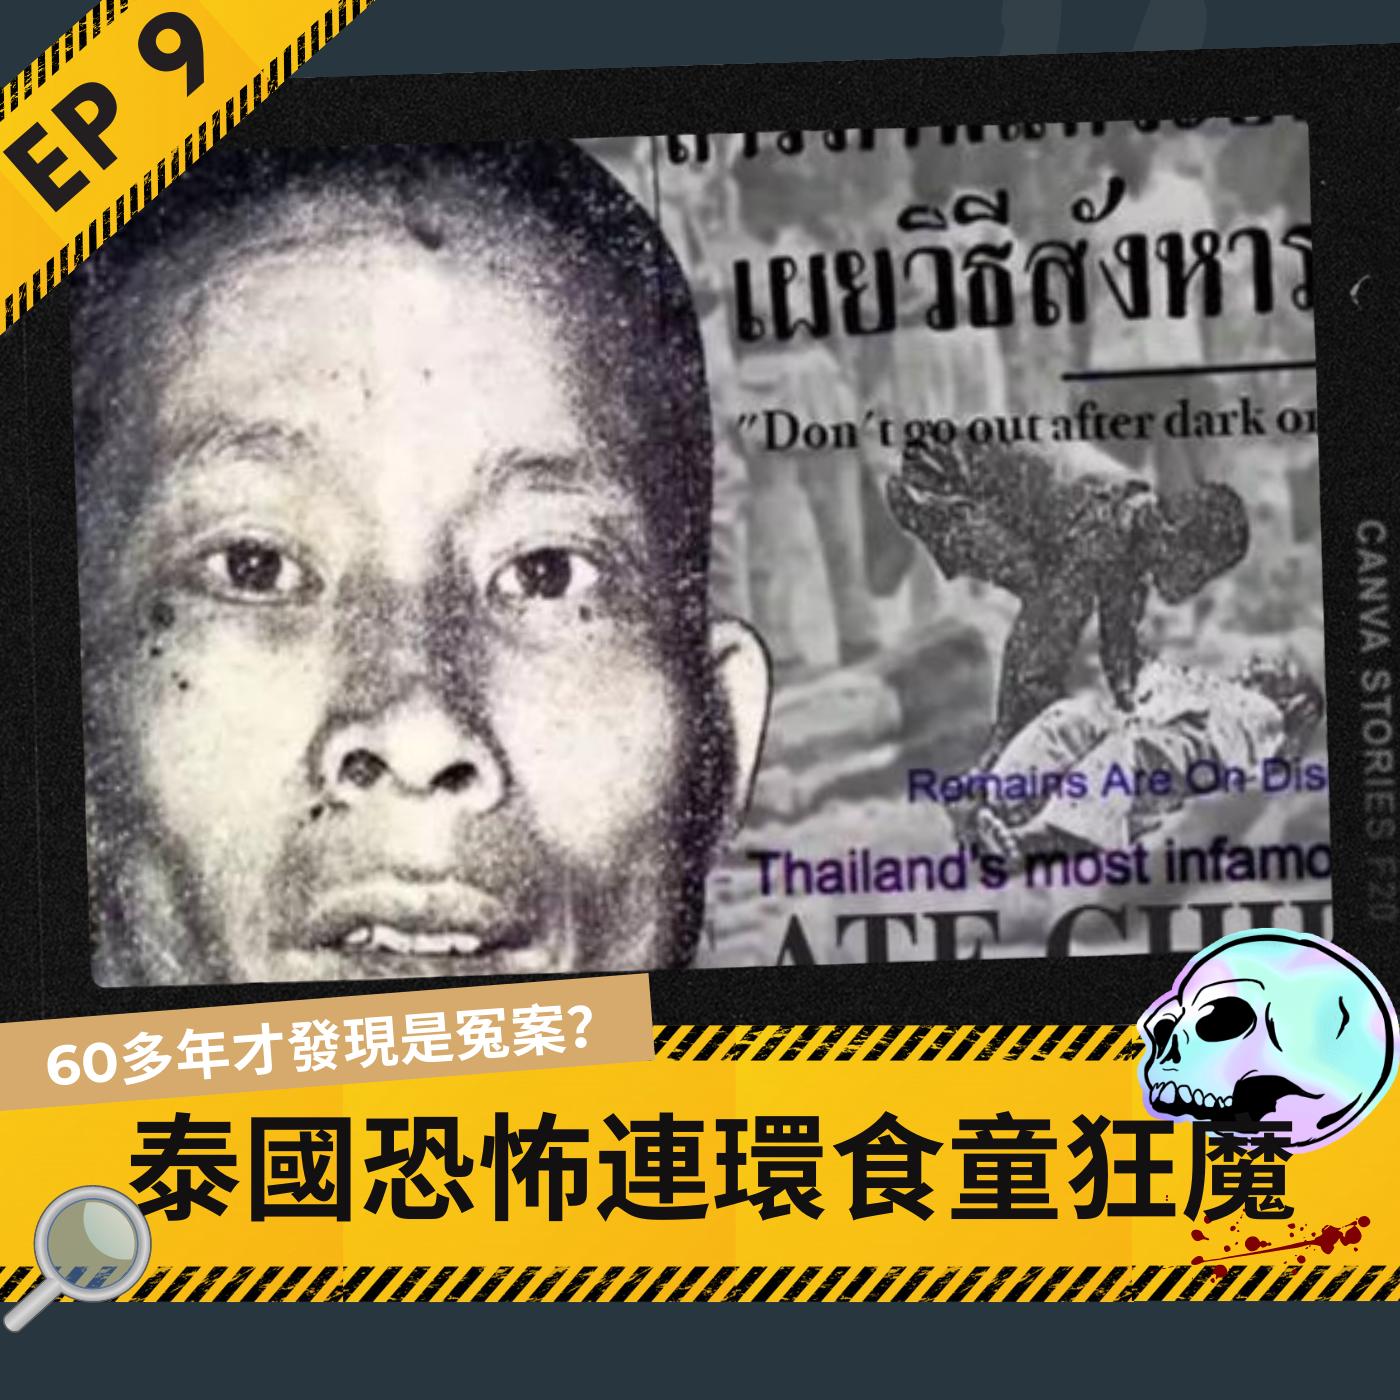 EP9- 泰國史上最恐怖的殺童食人狂魔! 60多年後才被人發現是被冤枉的?! 他死後, 還被製成乾屍在博物館內展出, 直到... |【泰國連環食童狂魔】